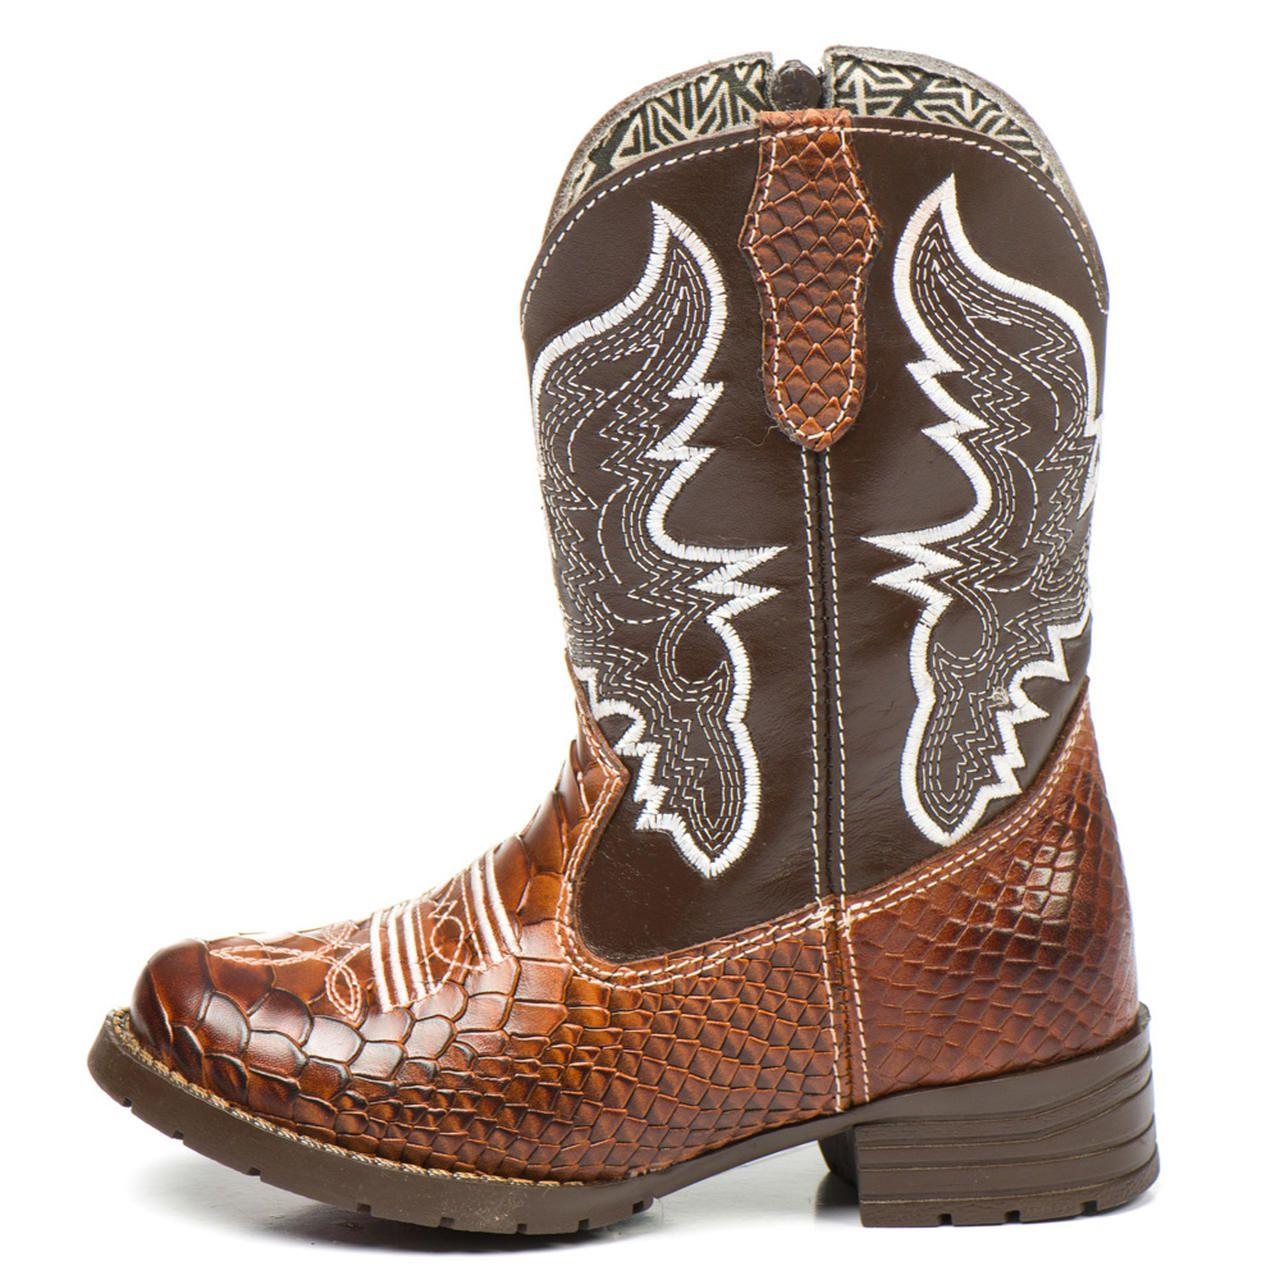 1b6310ec355c4e Bota Country Texana Infantil Marrom Masculina Menino Couro